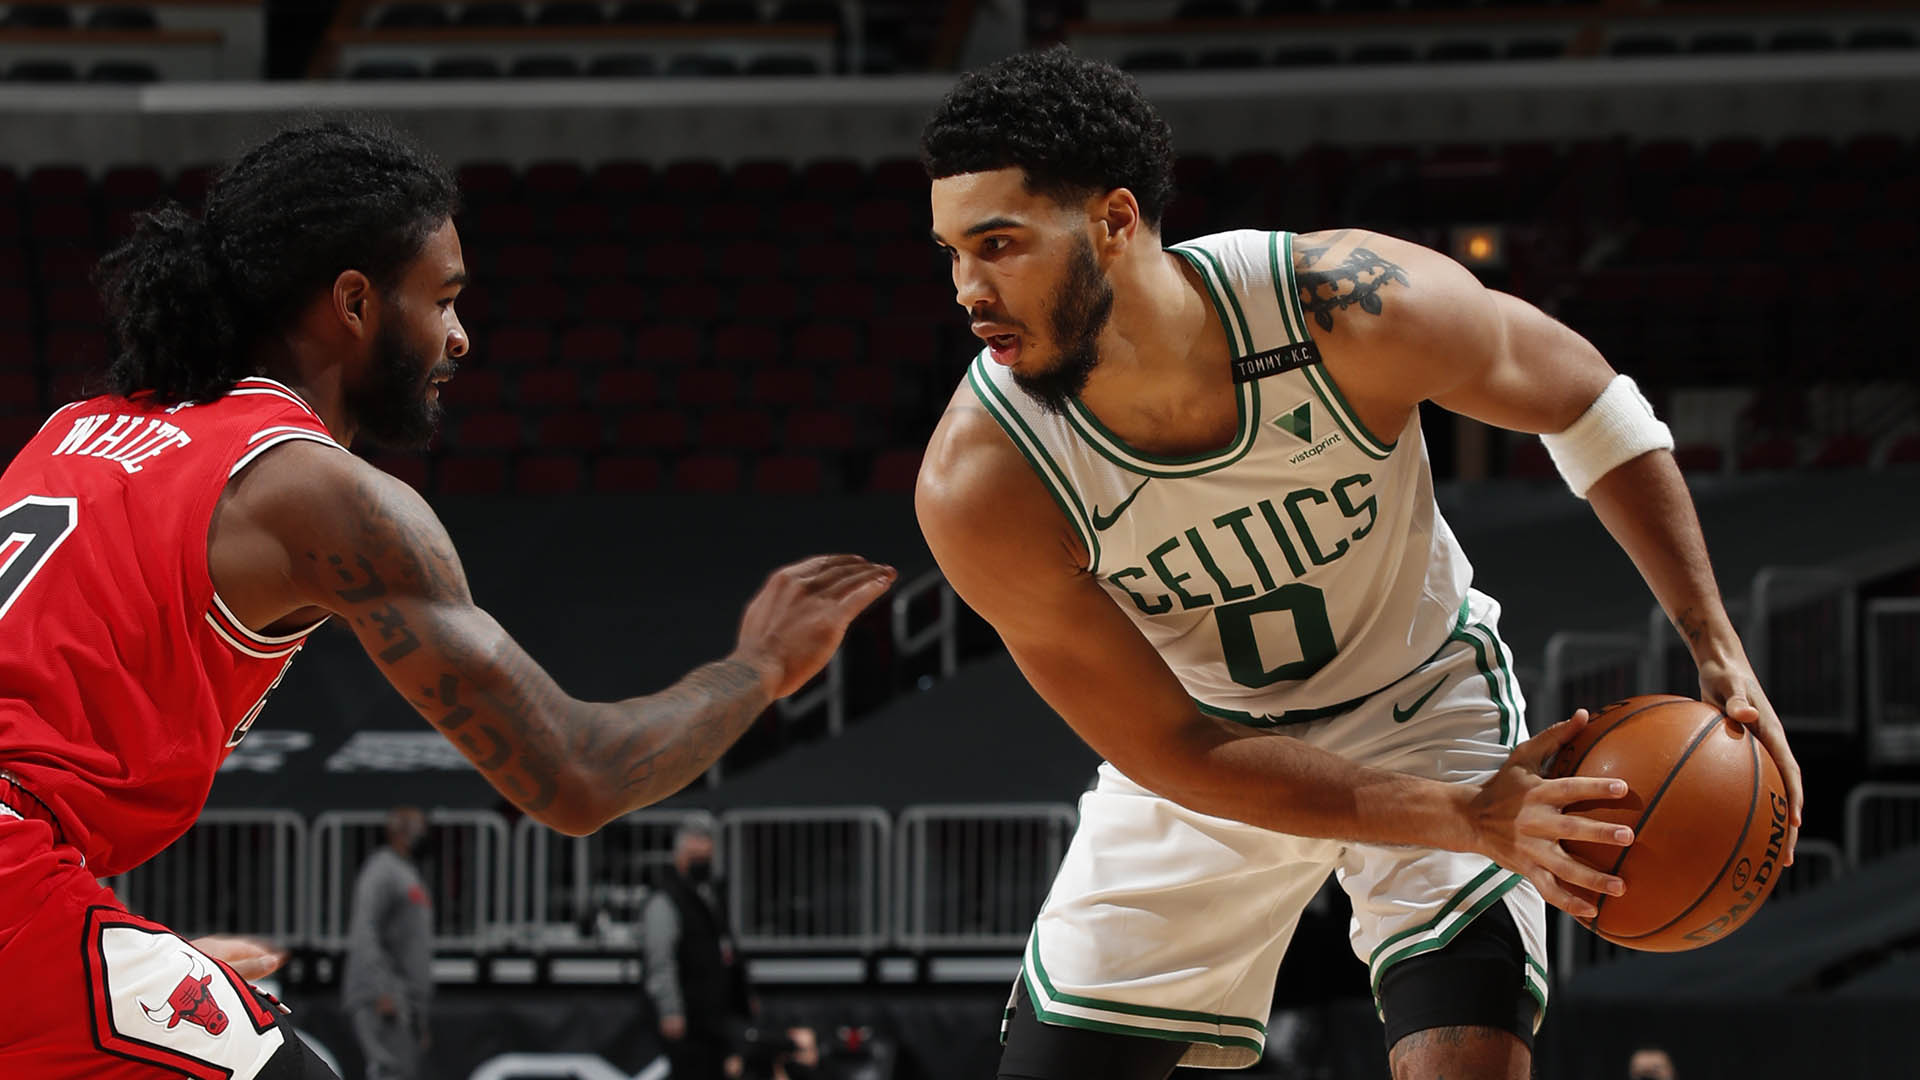 Celtics visit Bulls, look to maintain No. 6 spot